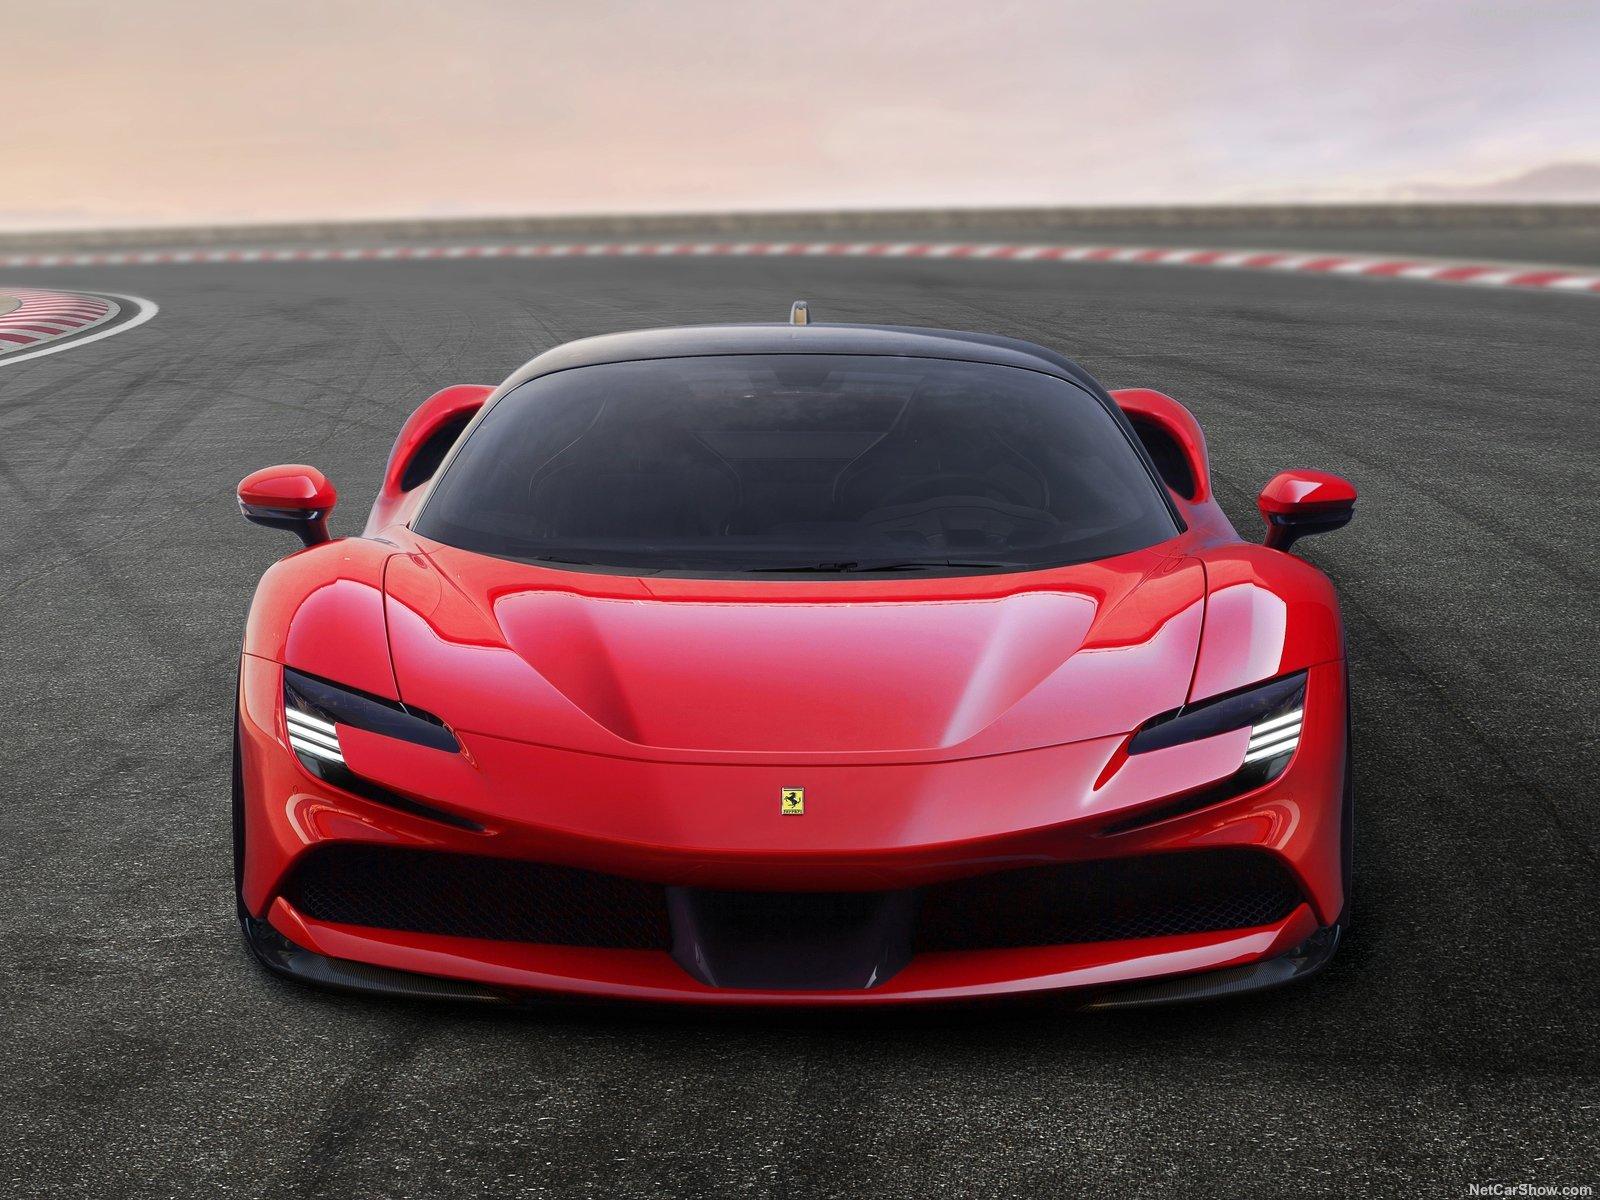 Ferrari-SF90_Stradale-2020-1600-05.jpg